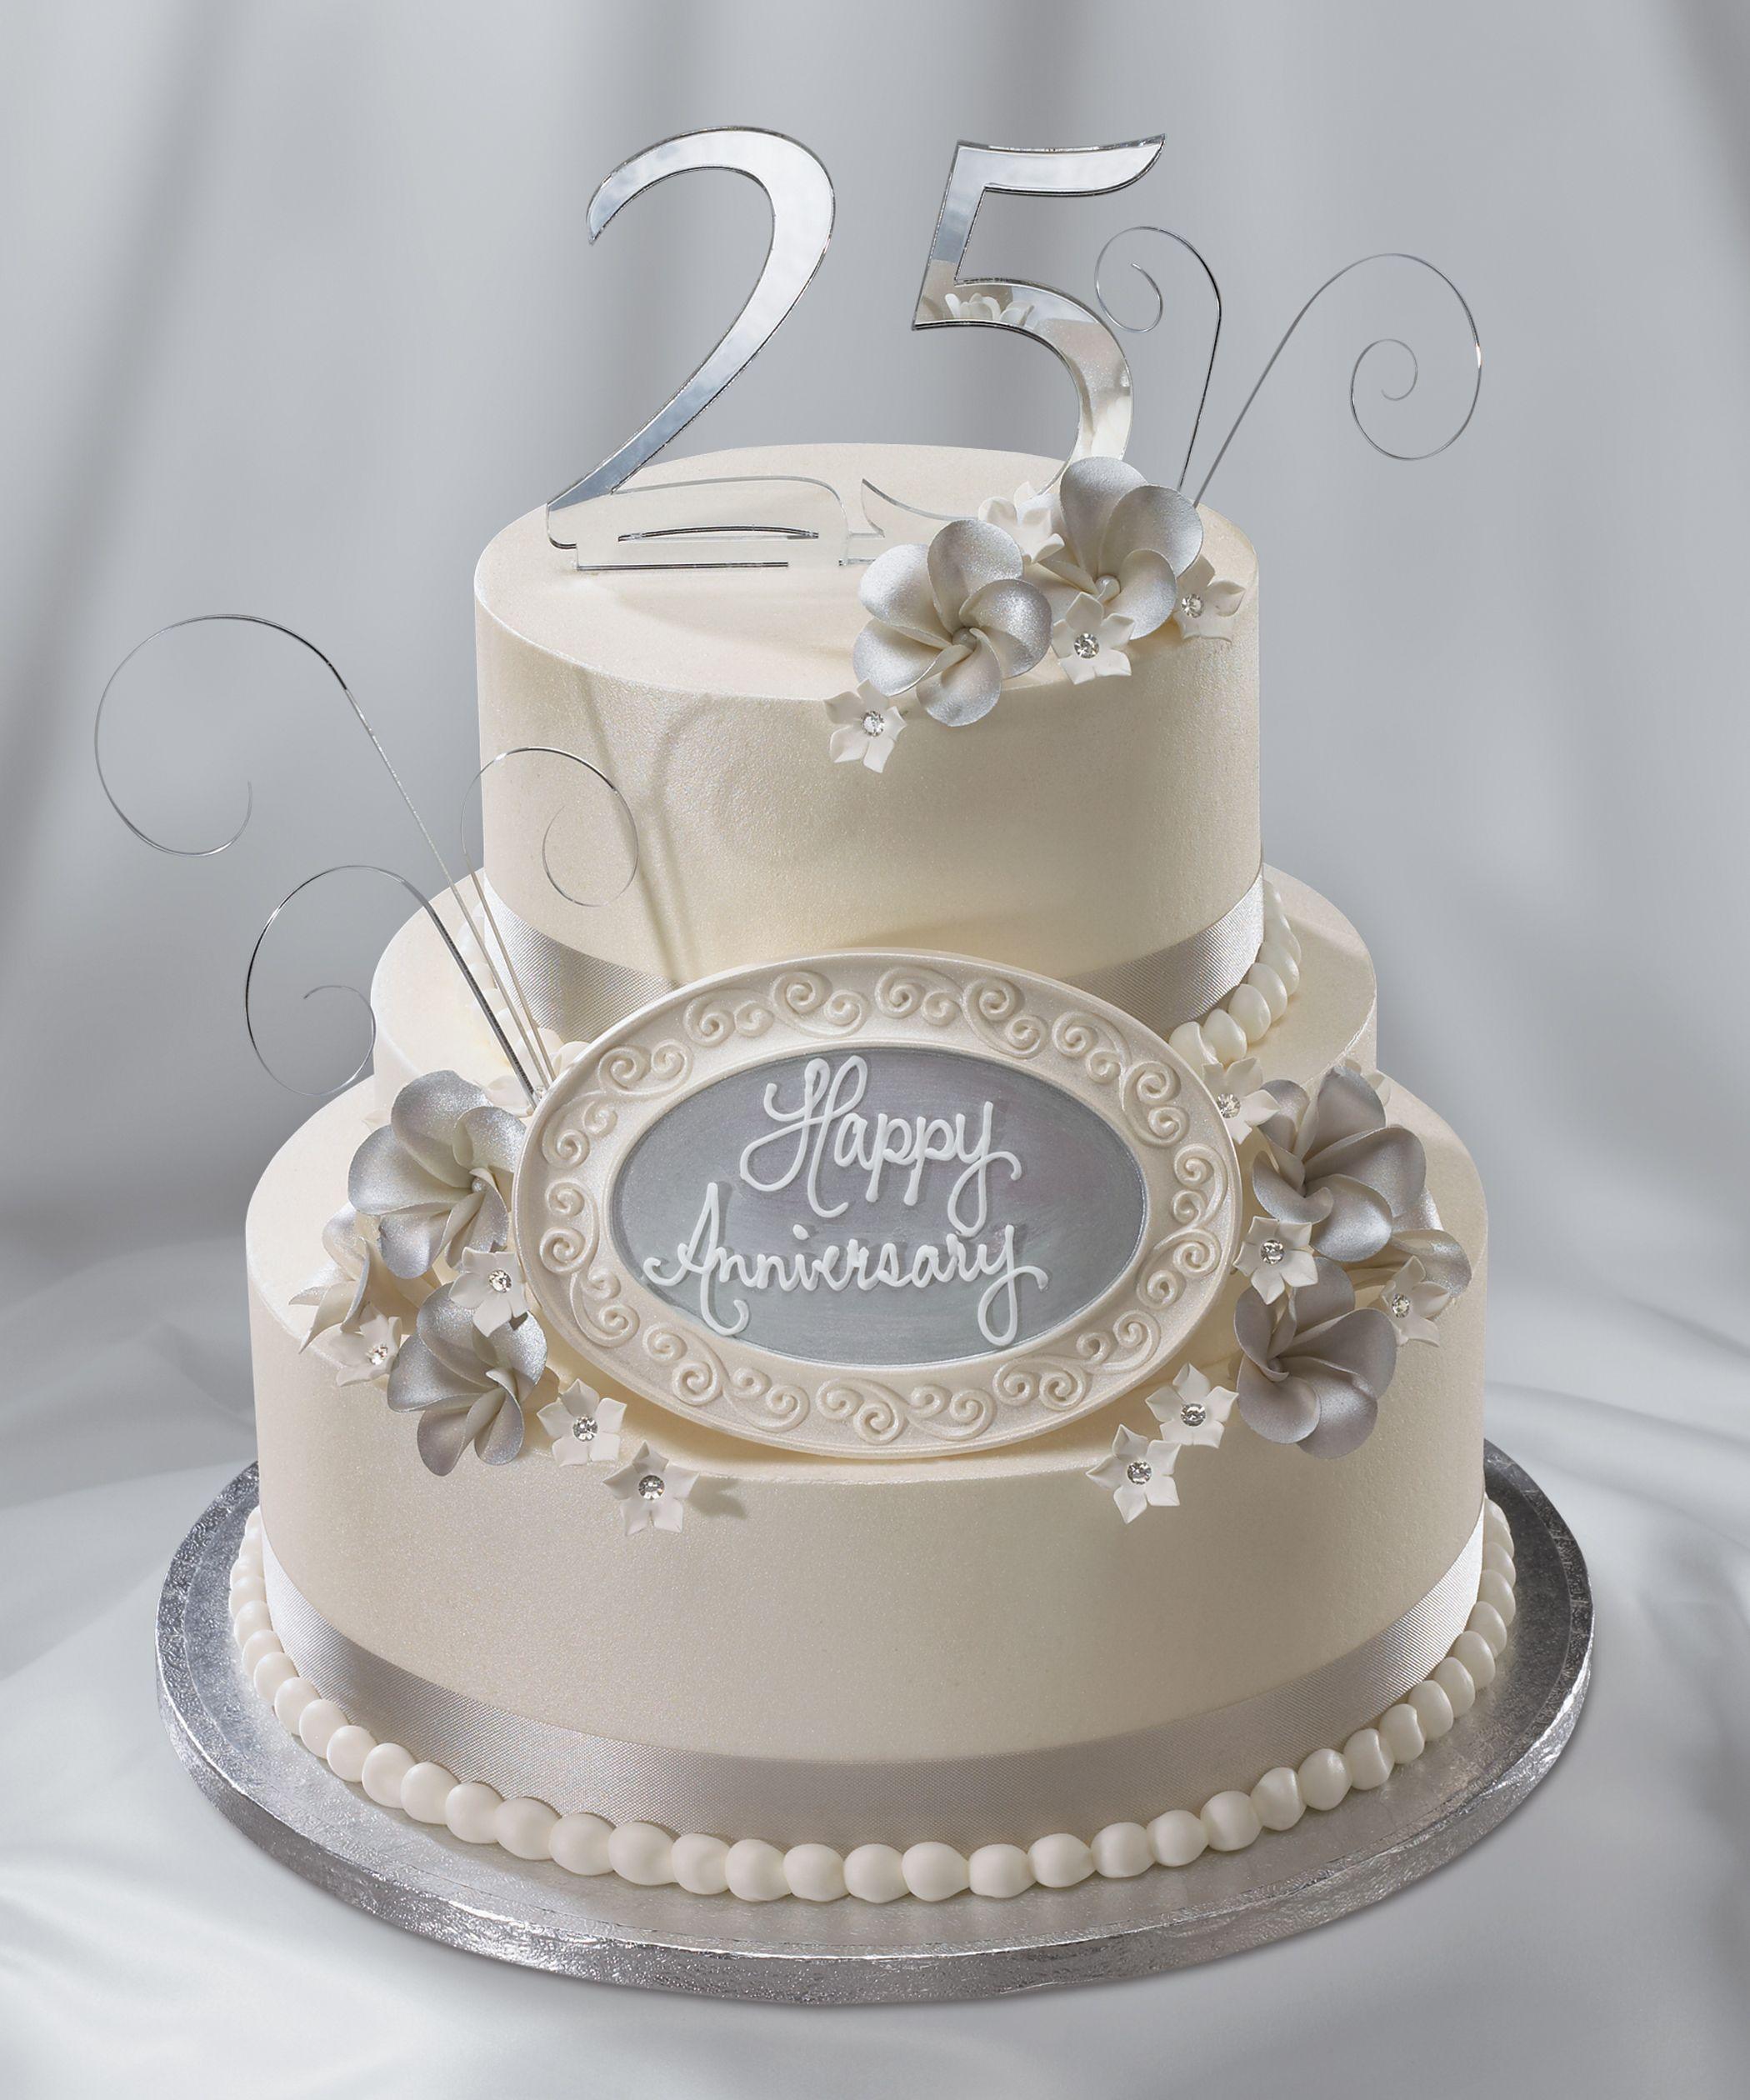 25th Wedding Anniversary Cake Silver Anniversary